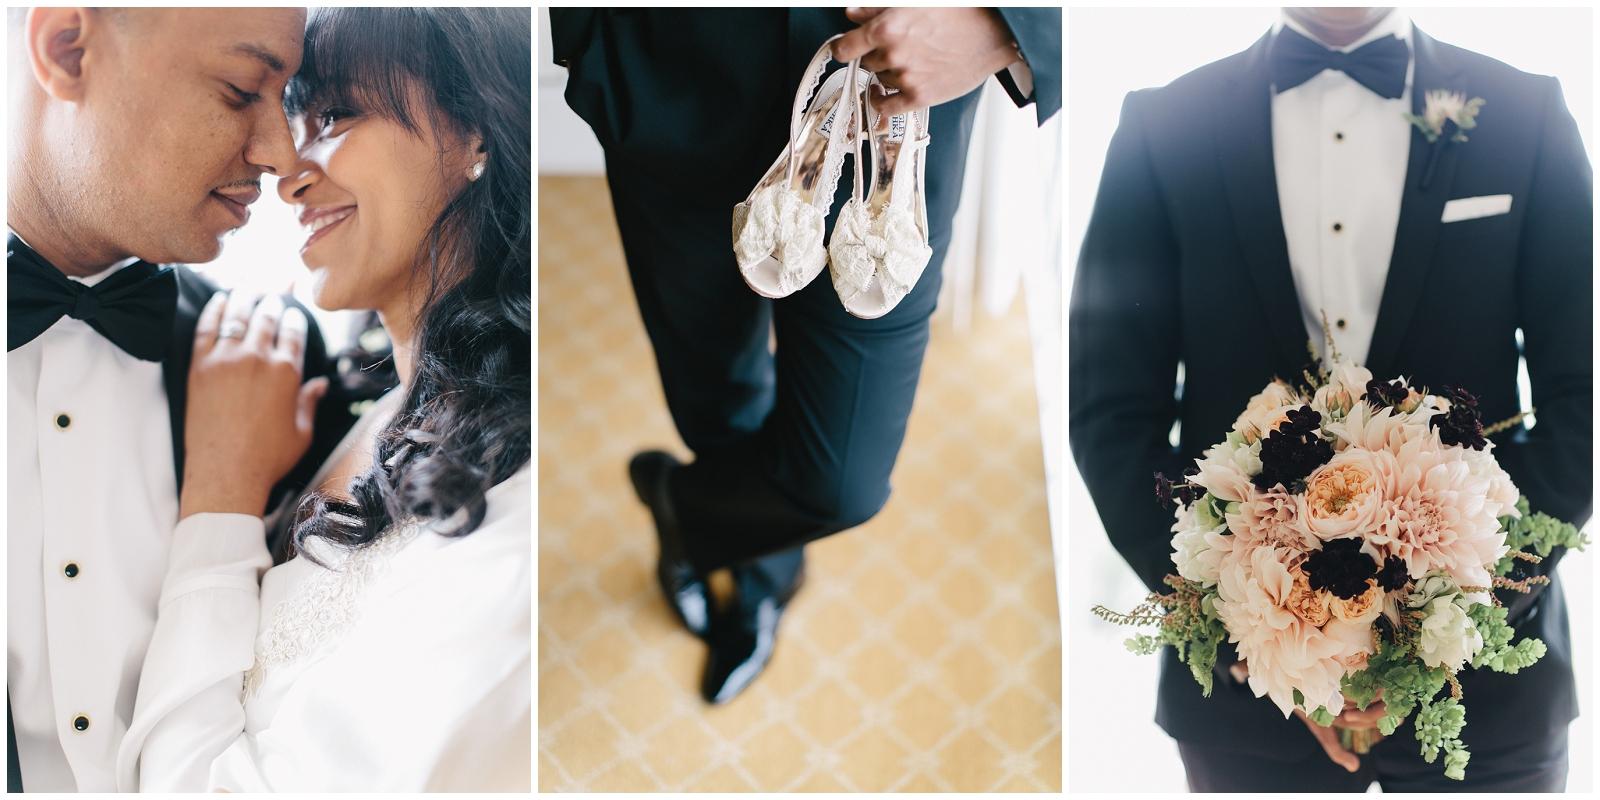 San-Francisco-Bay-Area-Wedding-Photography-Claremont-Hotel-10.jpg